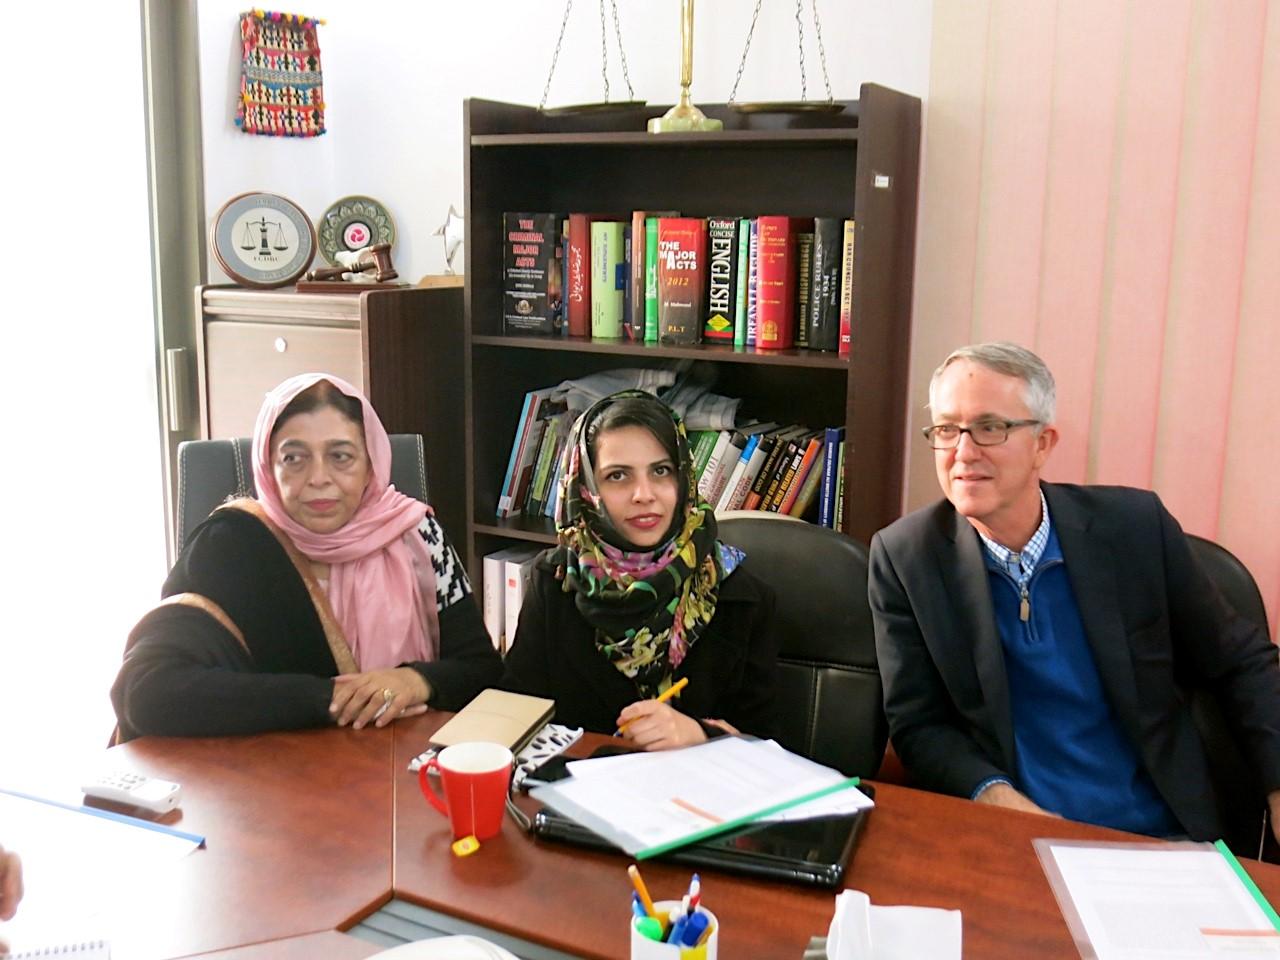 PJN International Legal Expert Visit to PJN Member Organization SHER